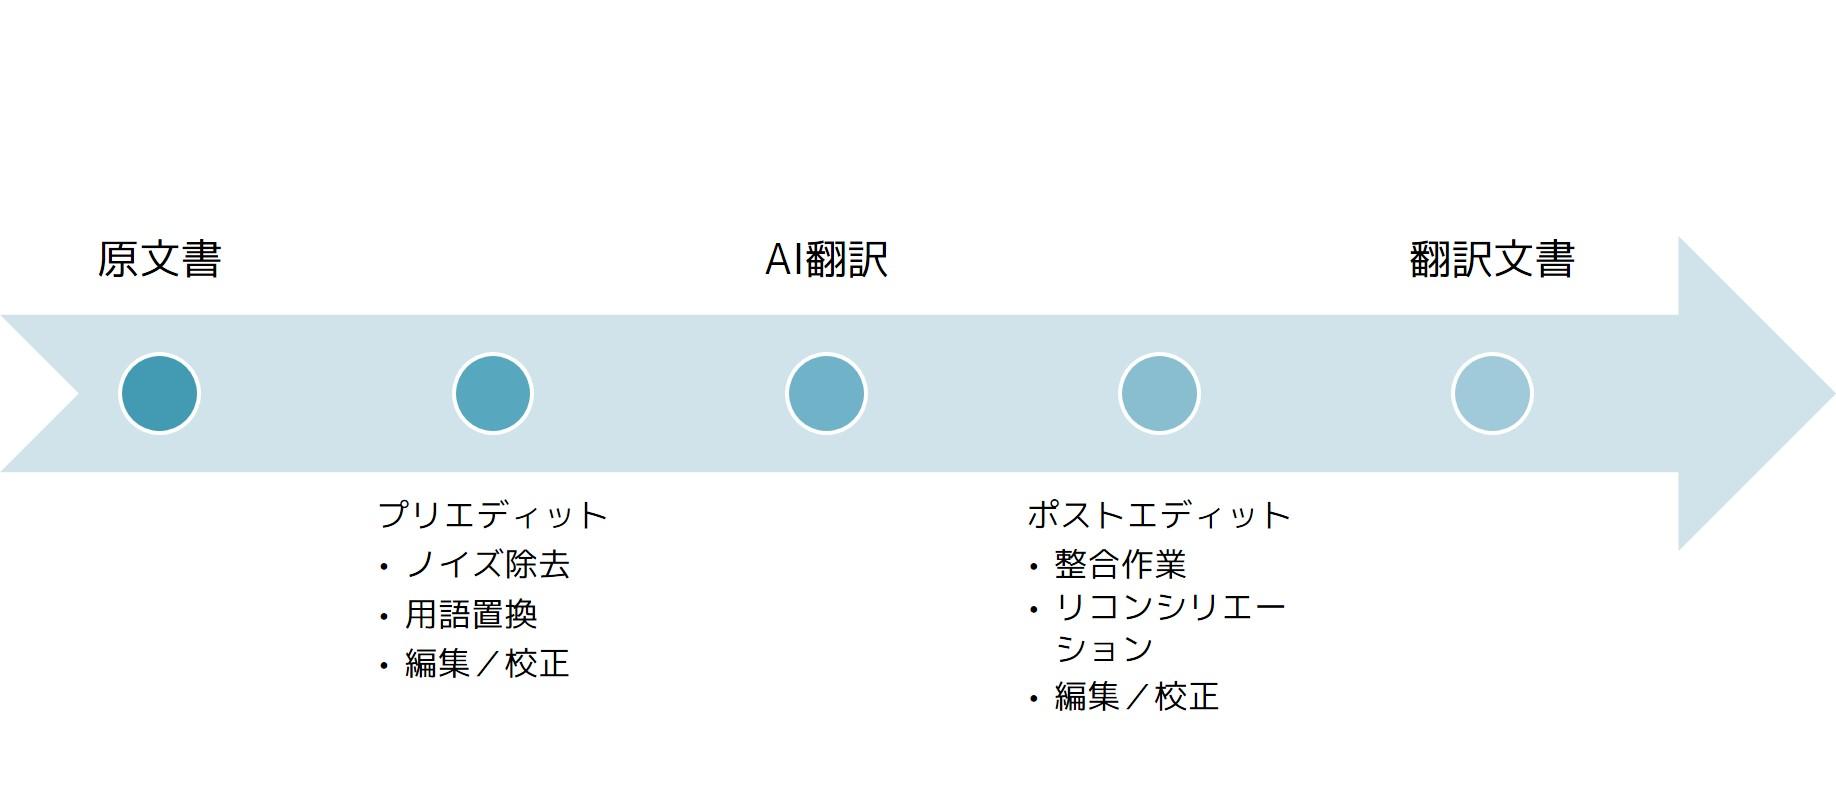 translab.jpg